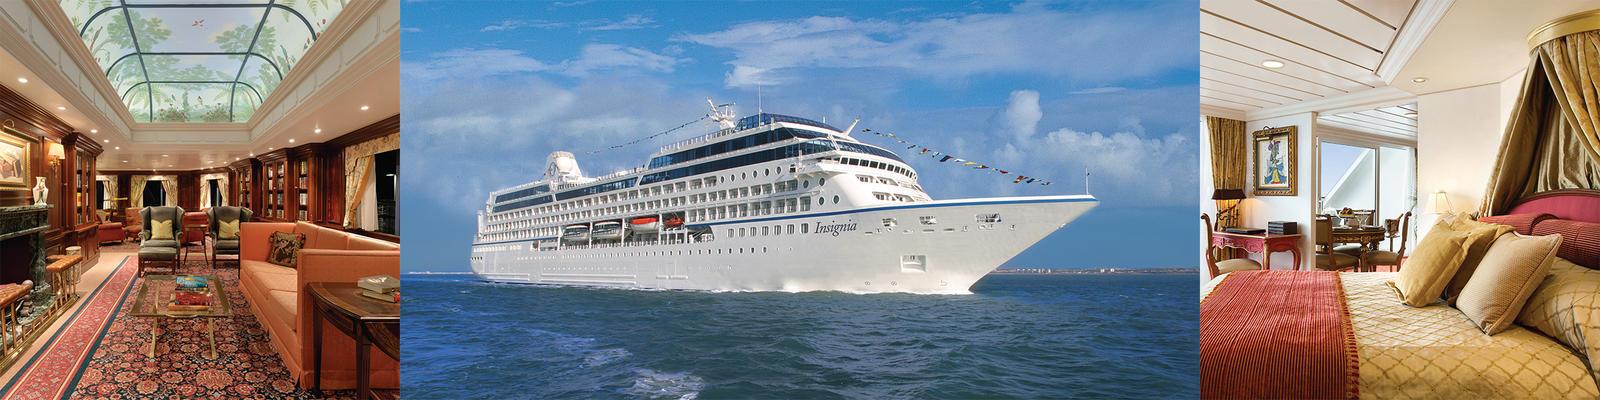 Oceania Insignia Cruise Ship Review Photos Departure Ports On - Insignia cruise ship